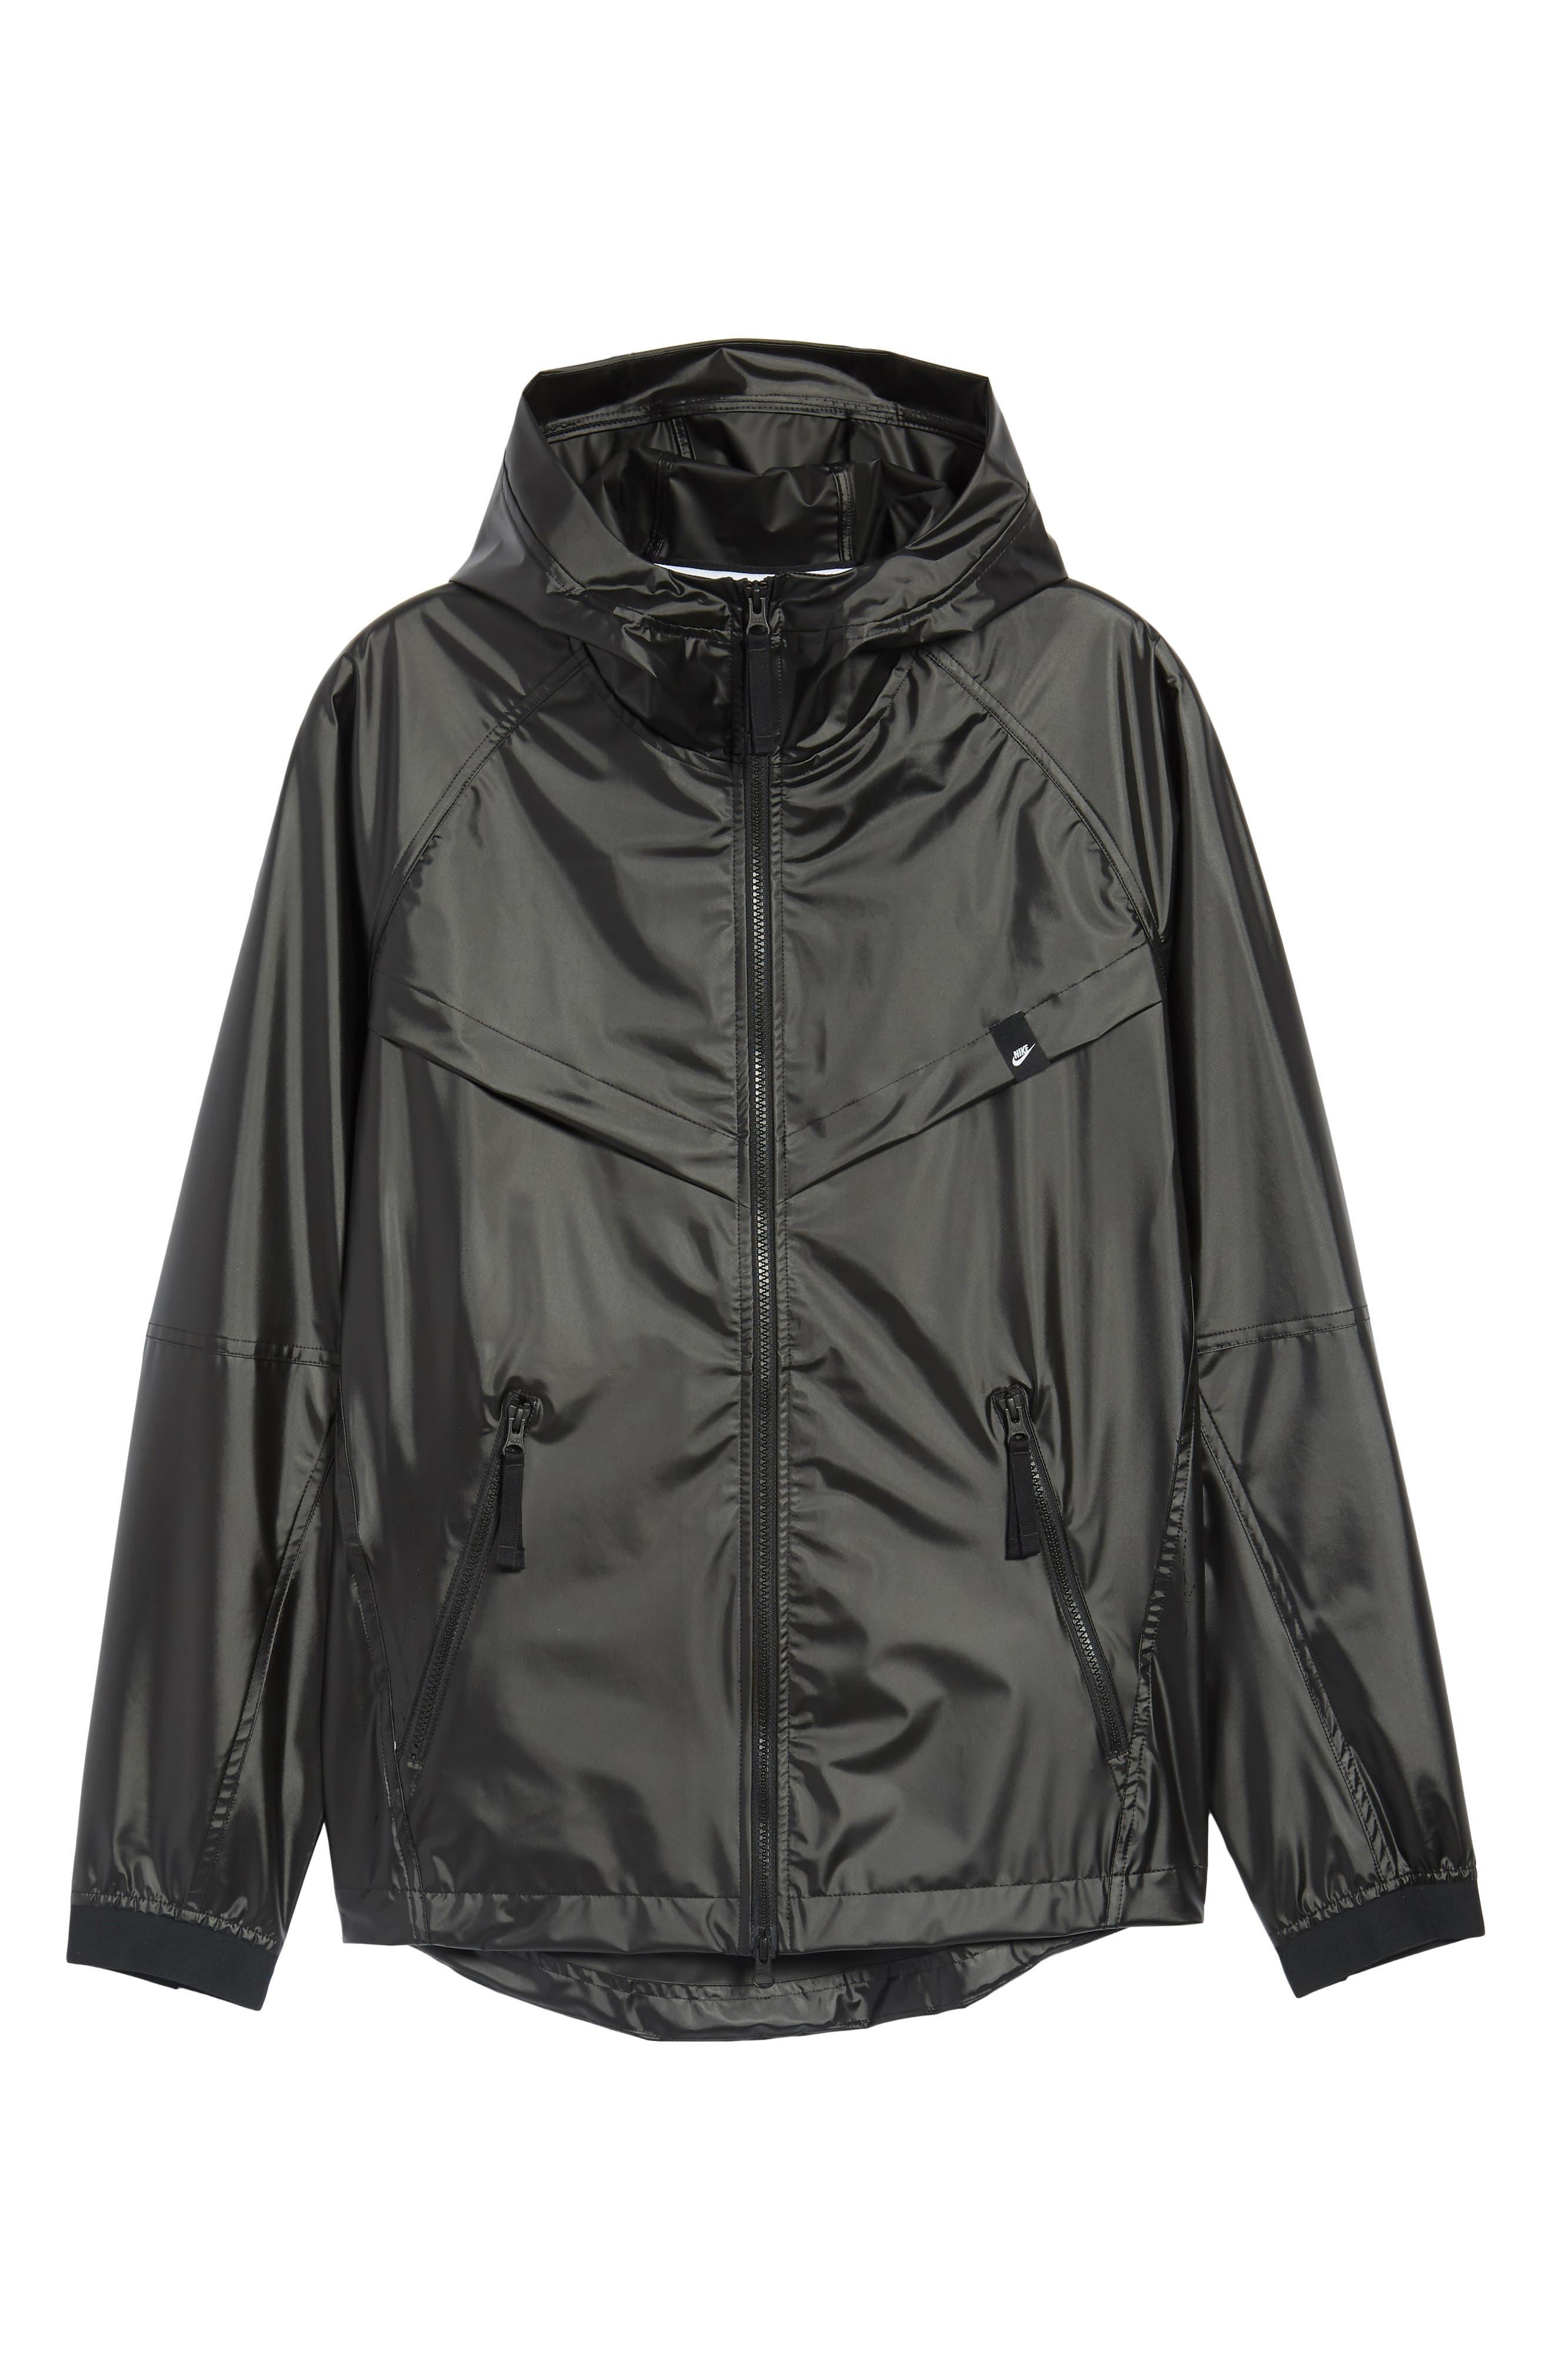 NSW Jacket,                             Alternate thumbnail 6, color,                             Black